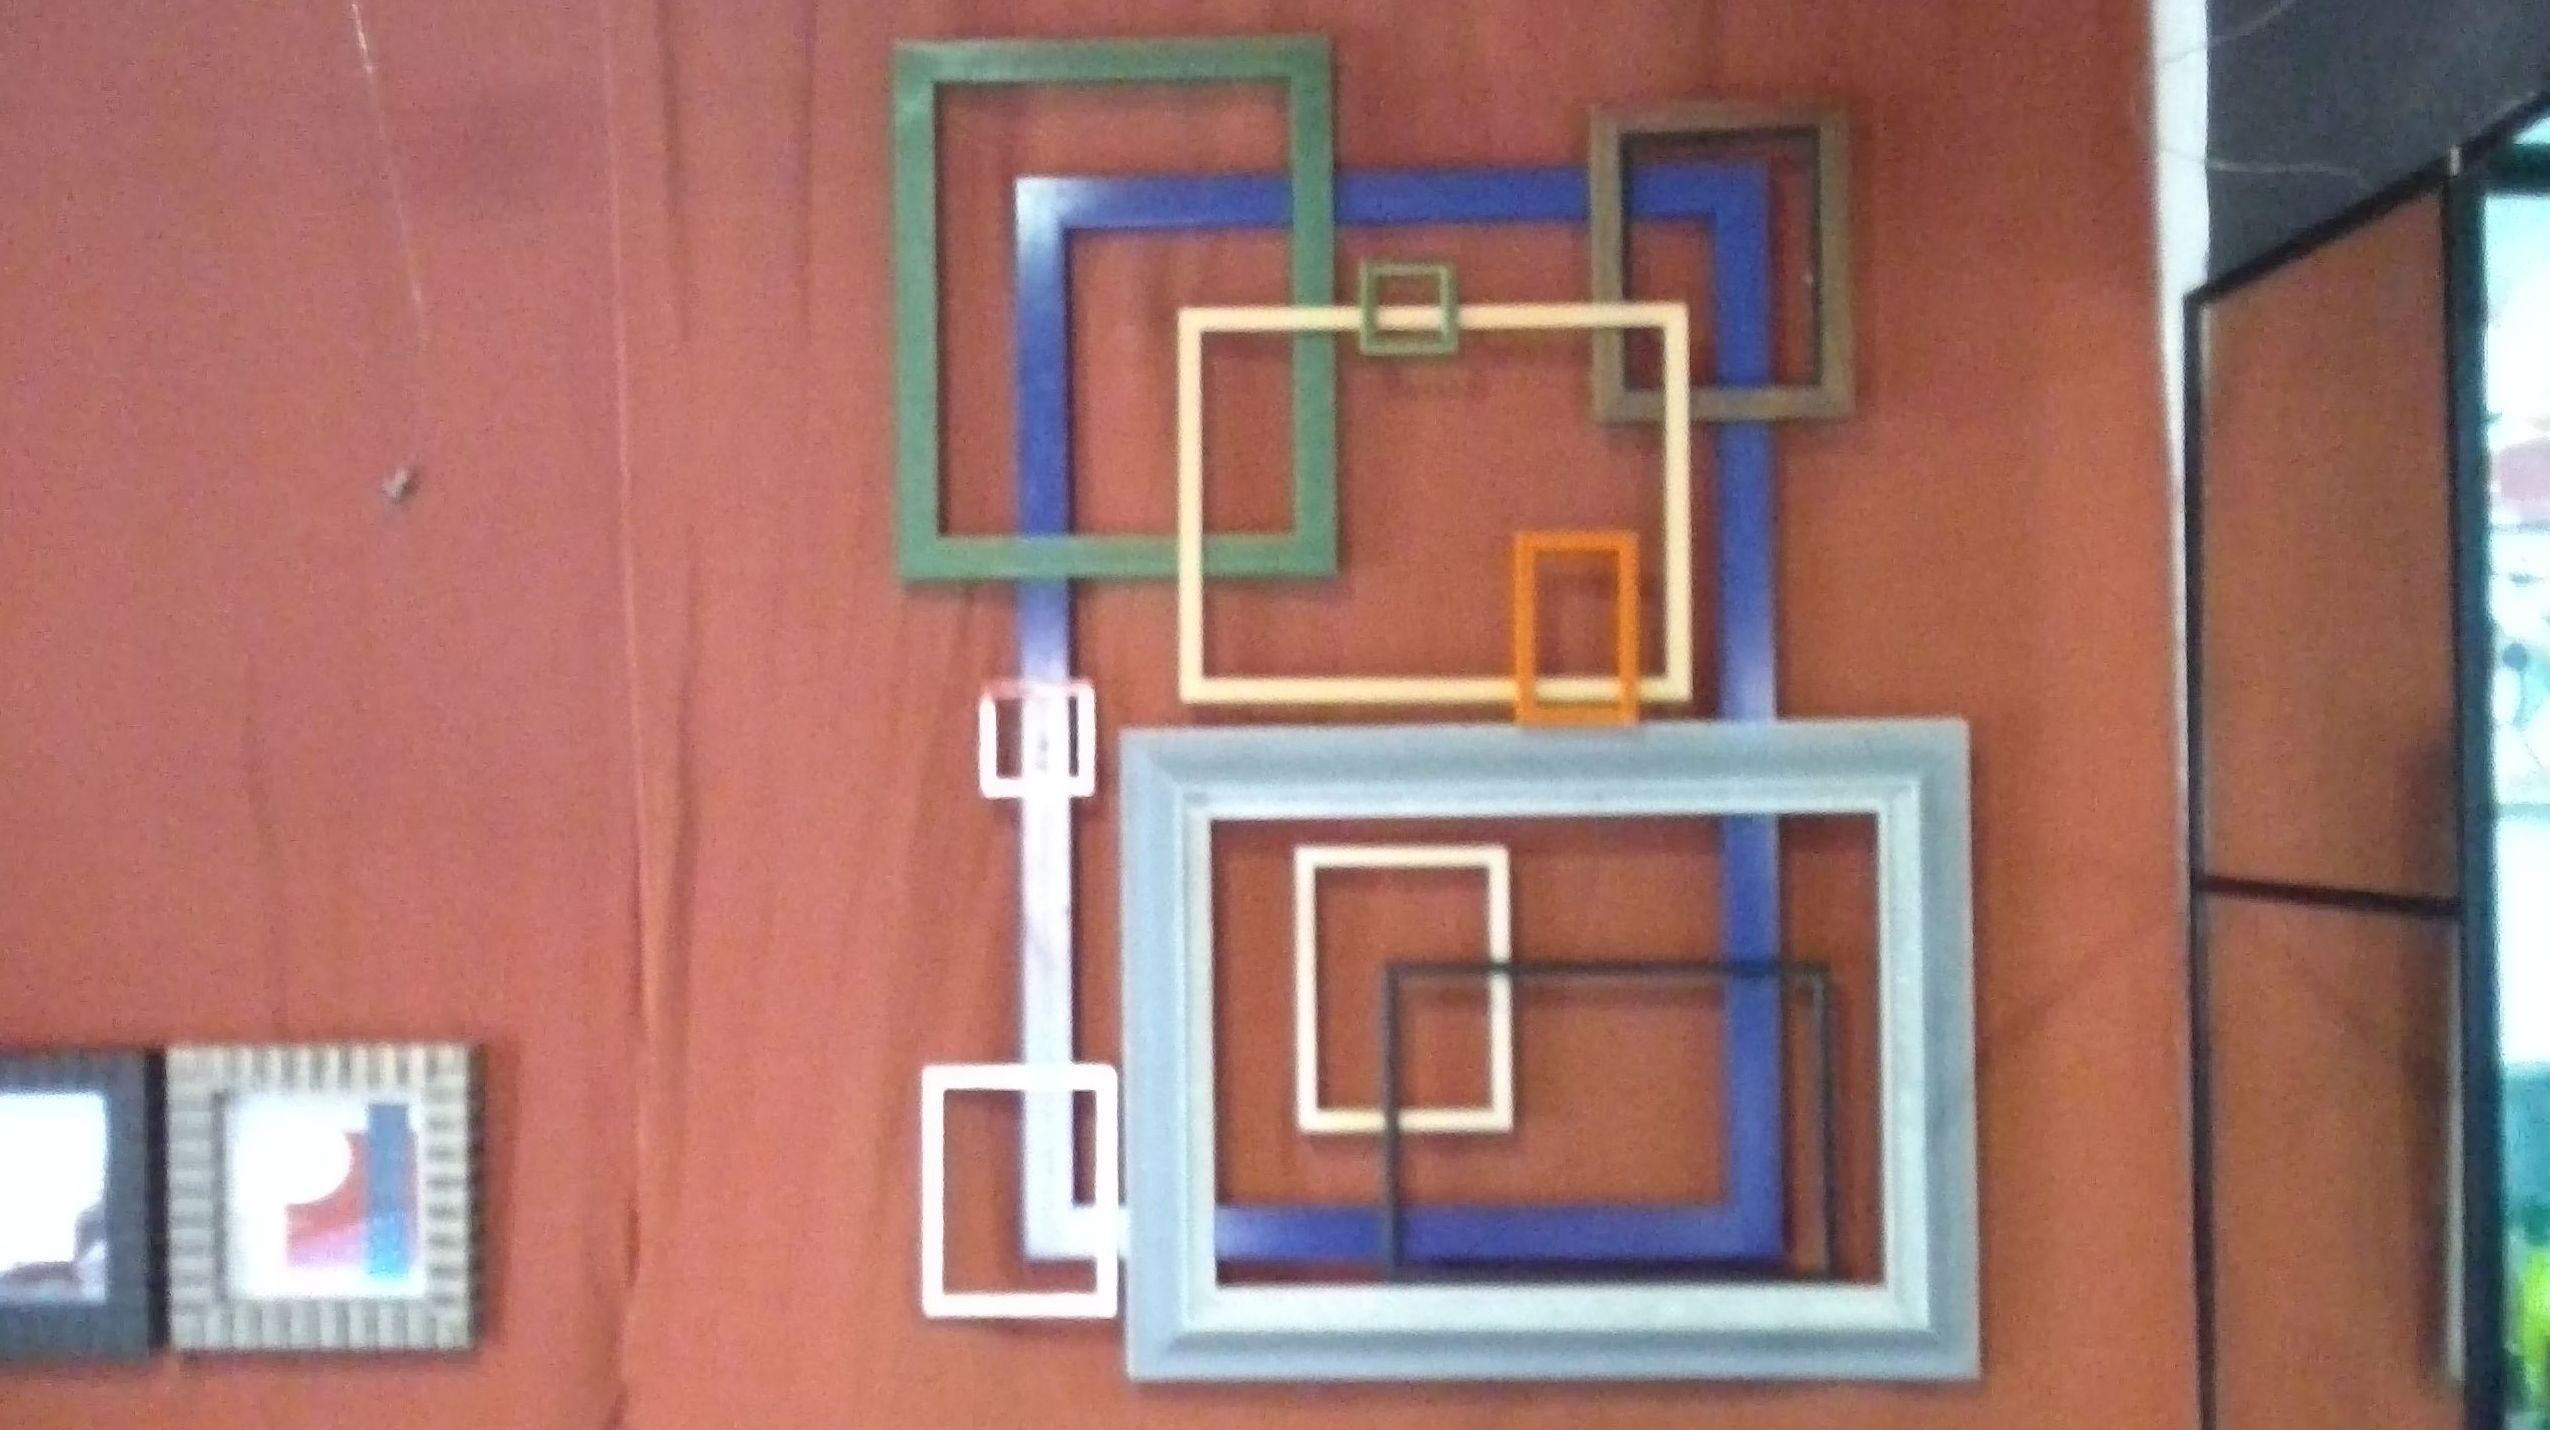 marcos madrid centro